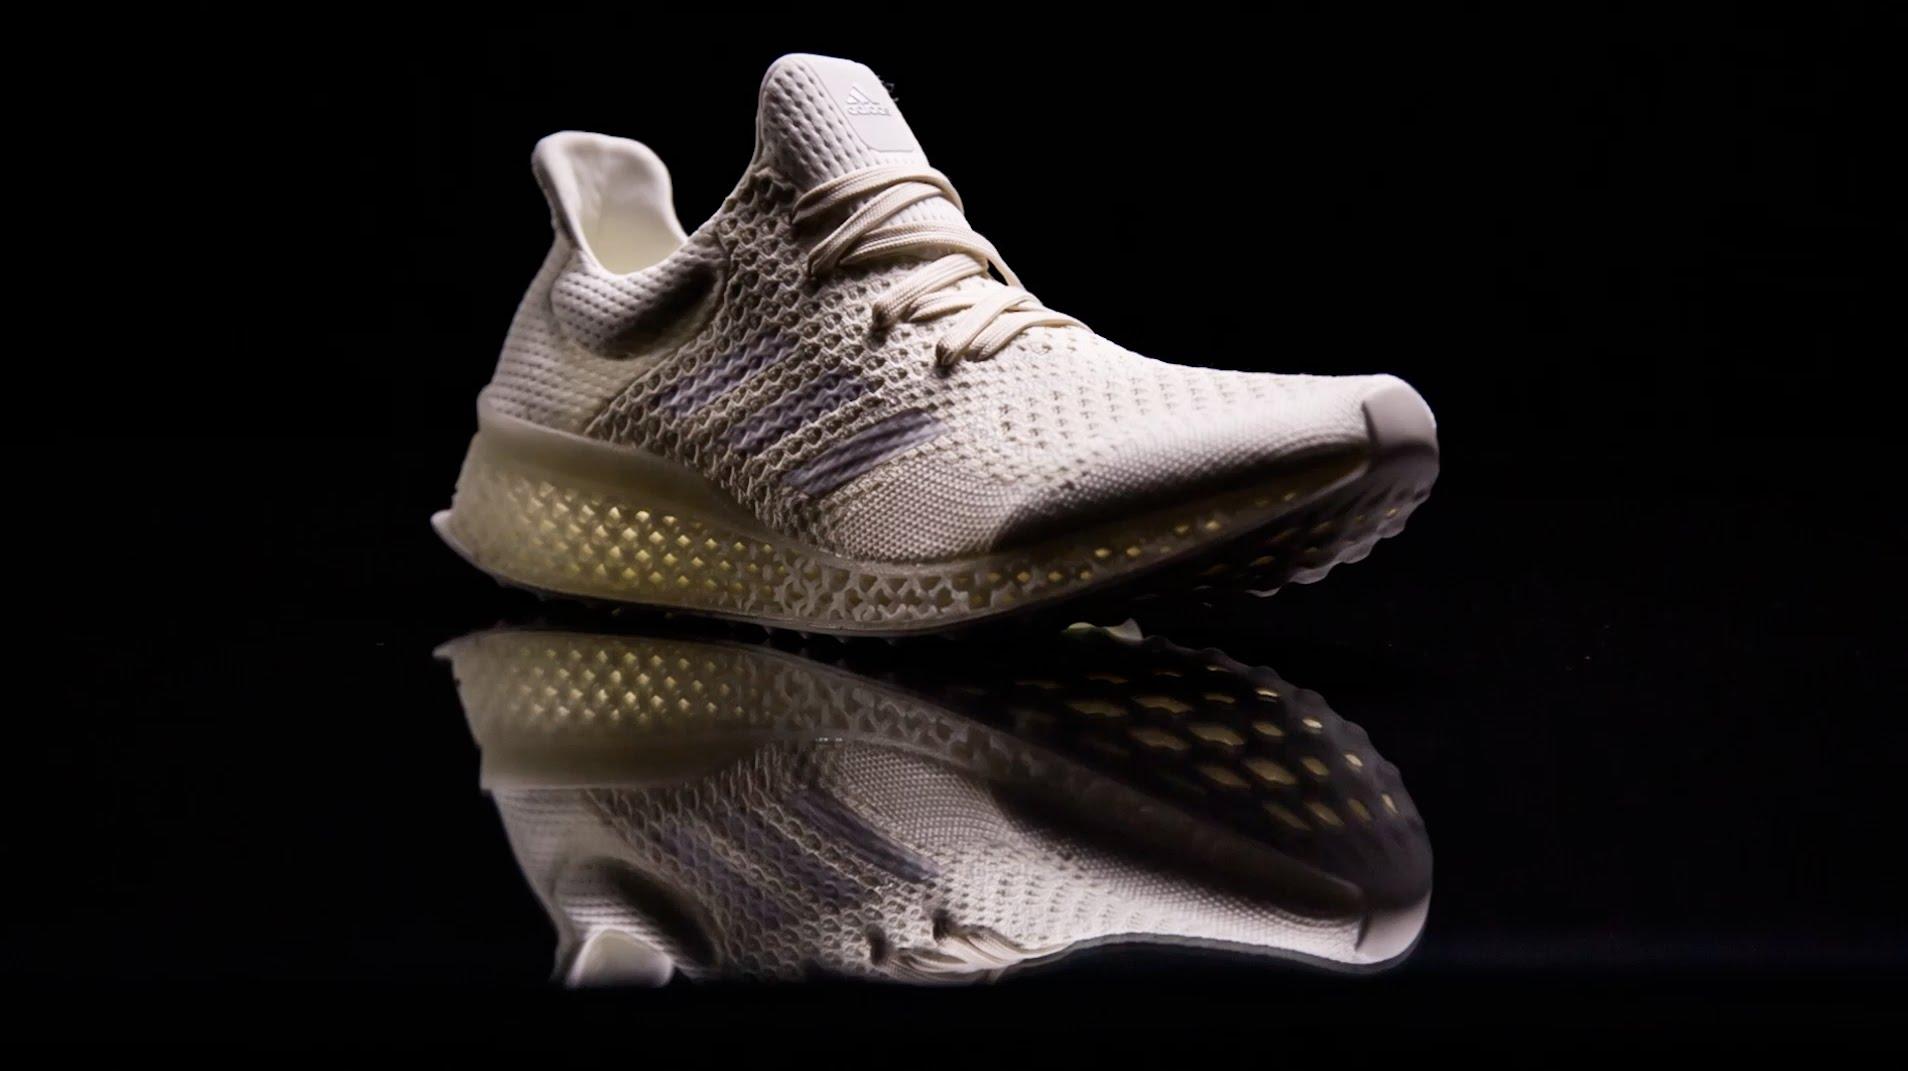 VIDEO: TENISICA BUDUĆNOSTI Adidas najavio Futurecraft, tenisicu iz 3D printera